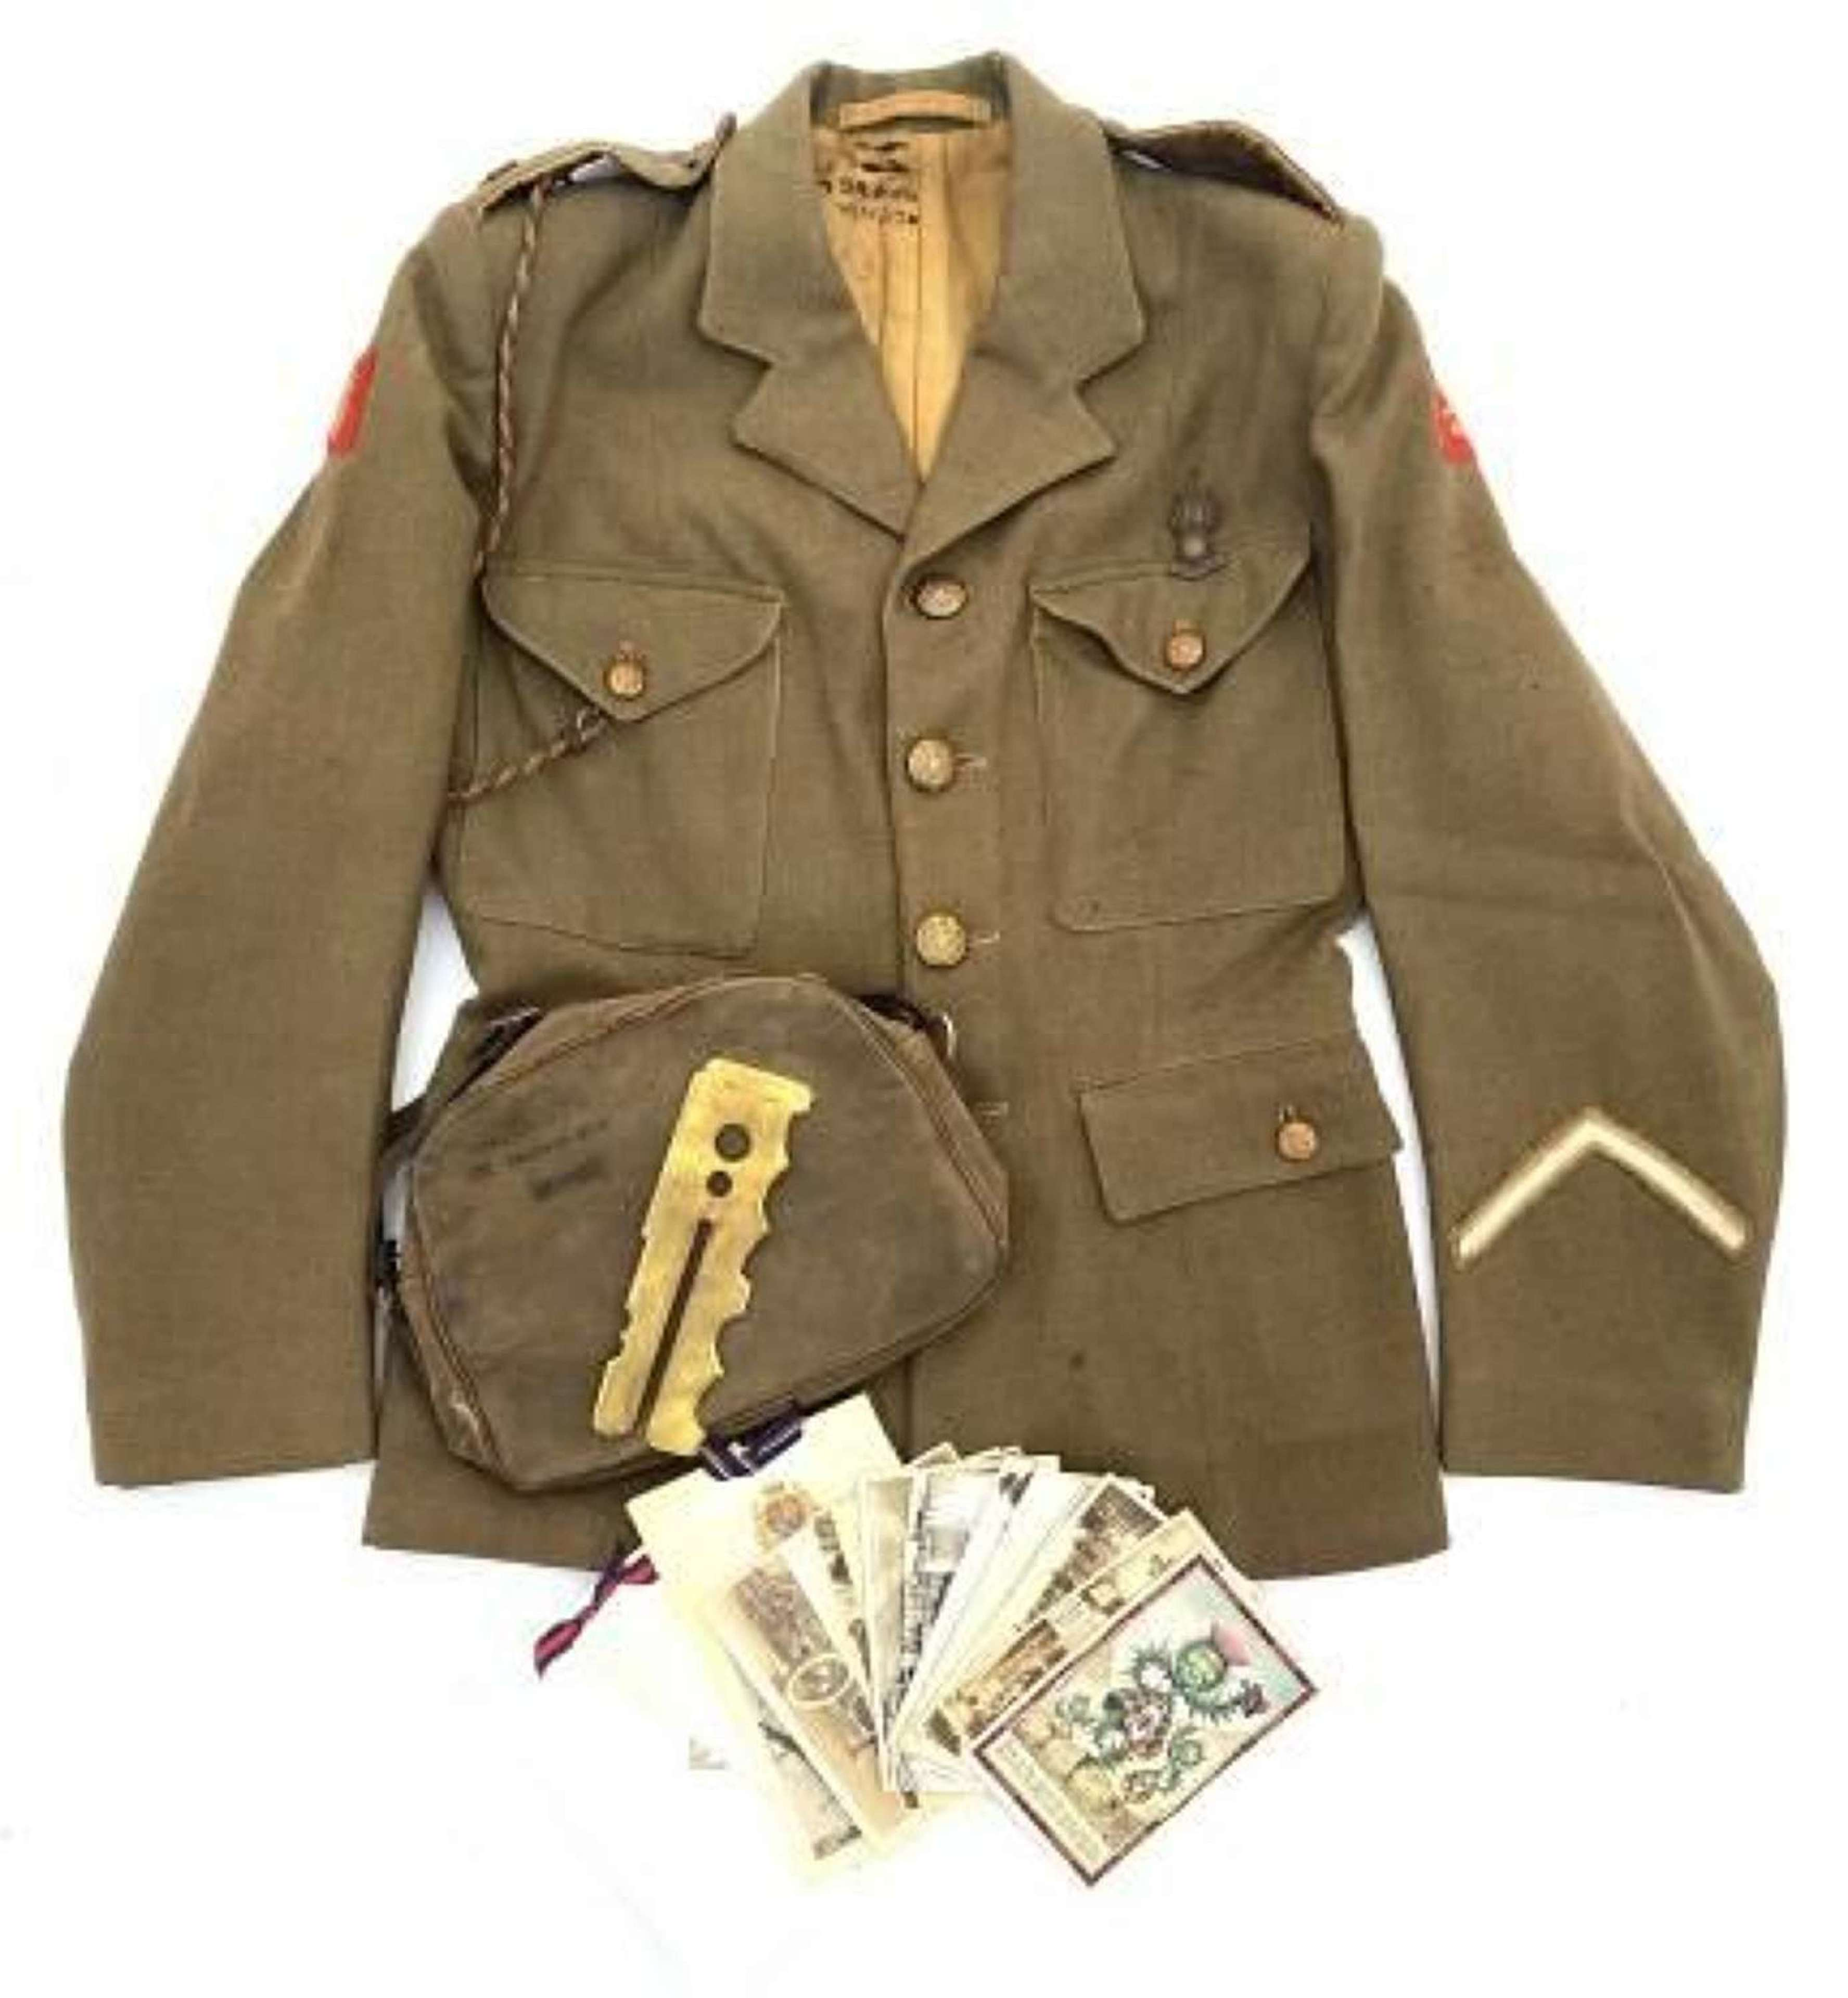 Original WW2 ATS 1942 Dated Scottish Command Tunic and Handbag Group